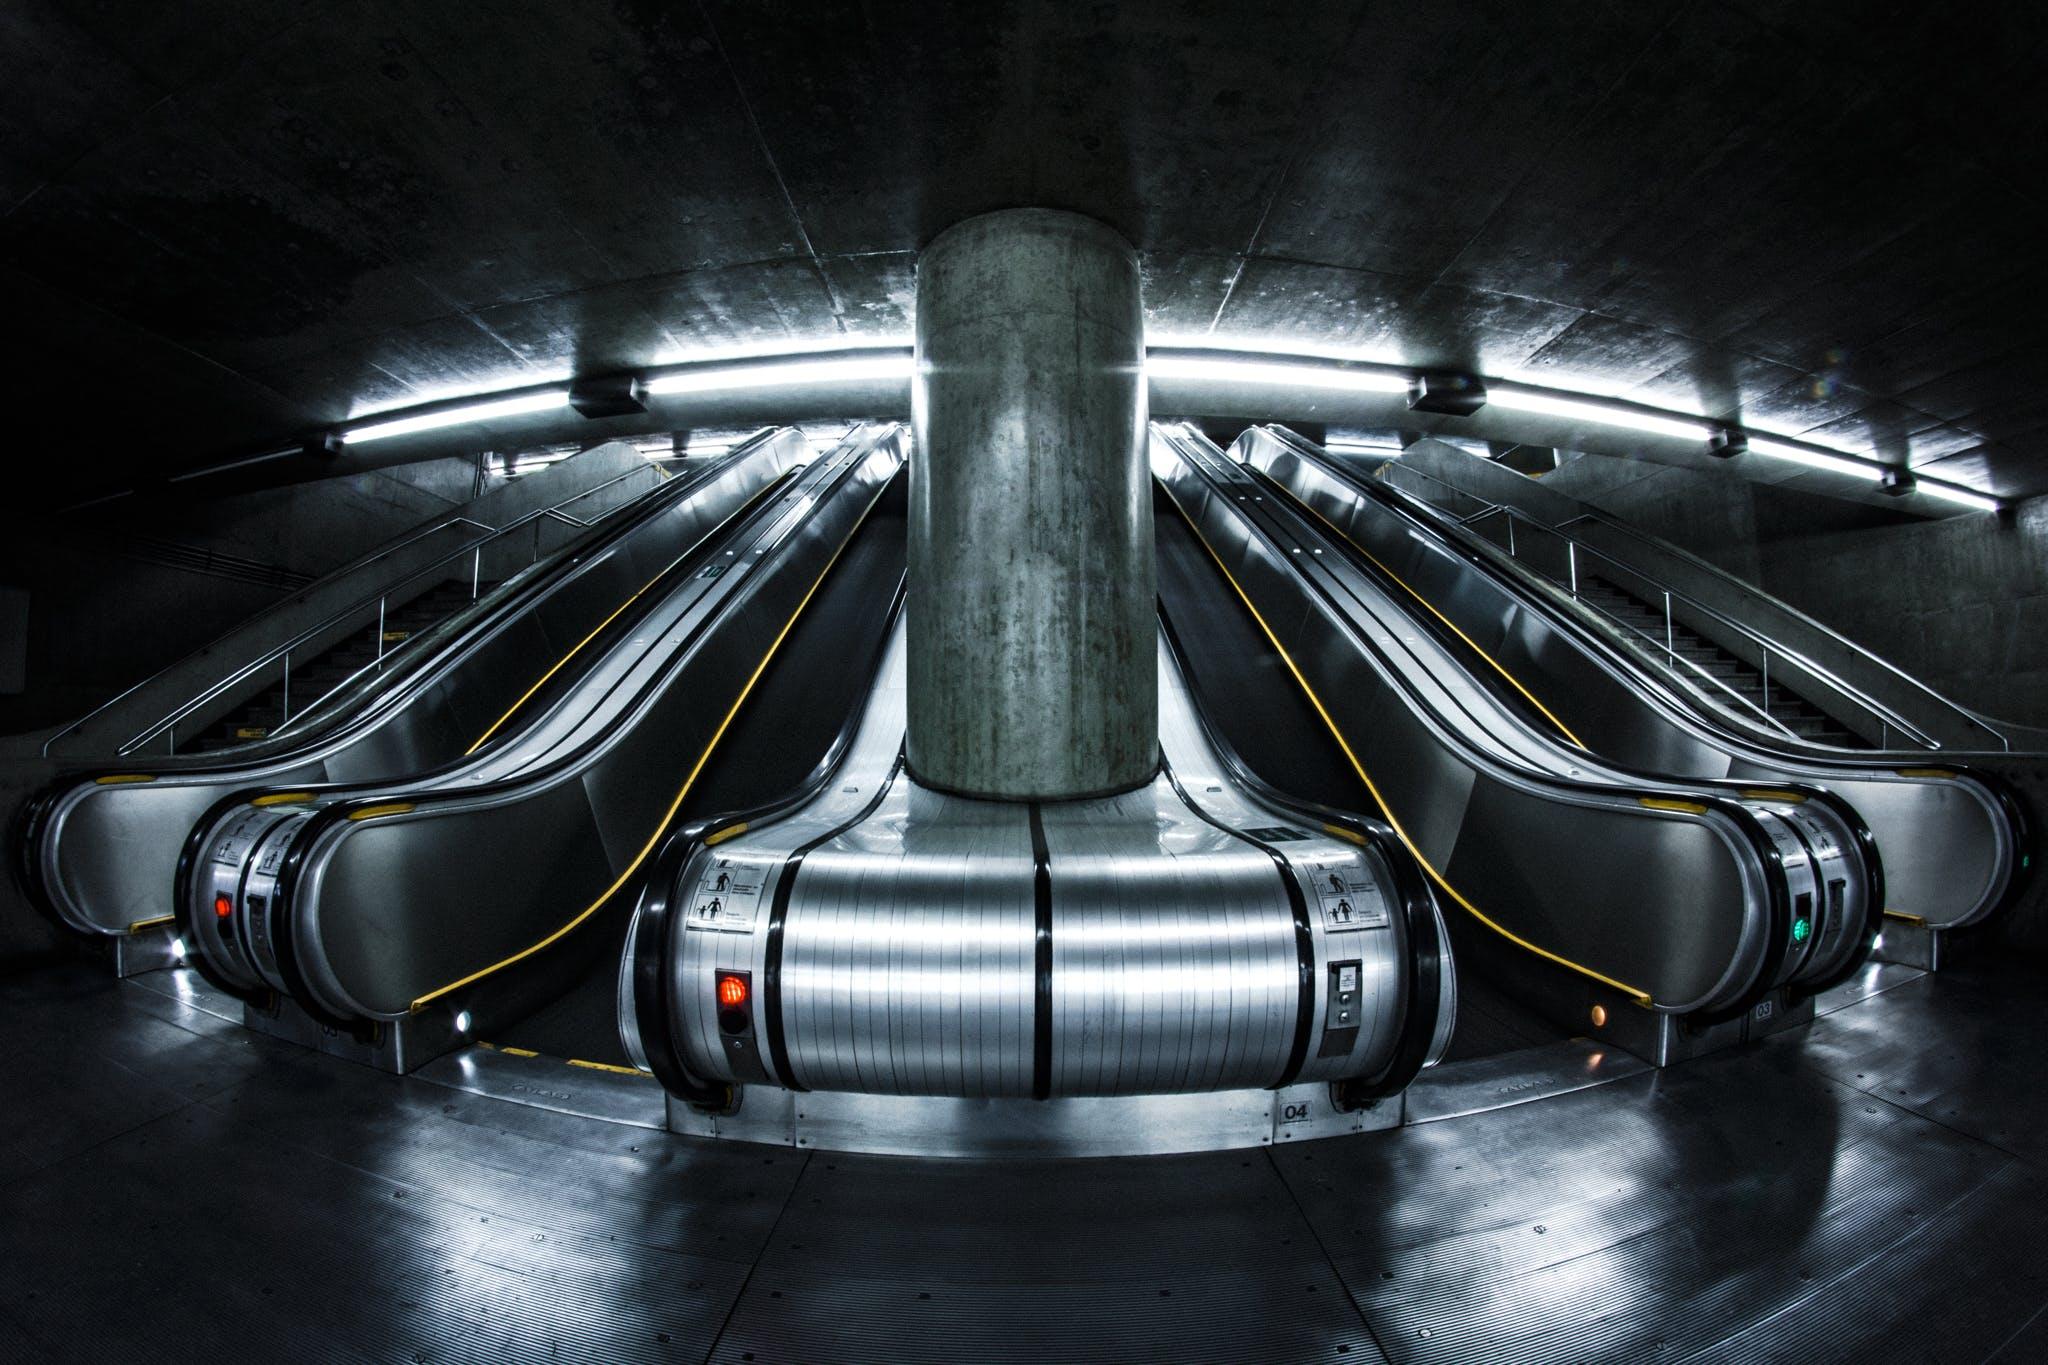 Grayscale Photography of Escalators